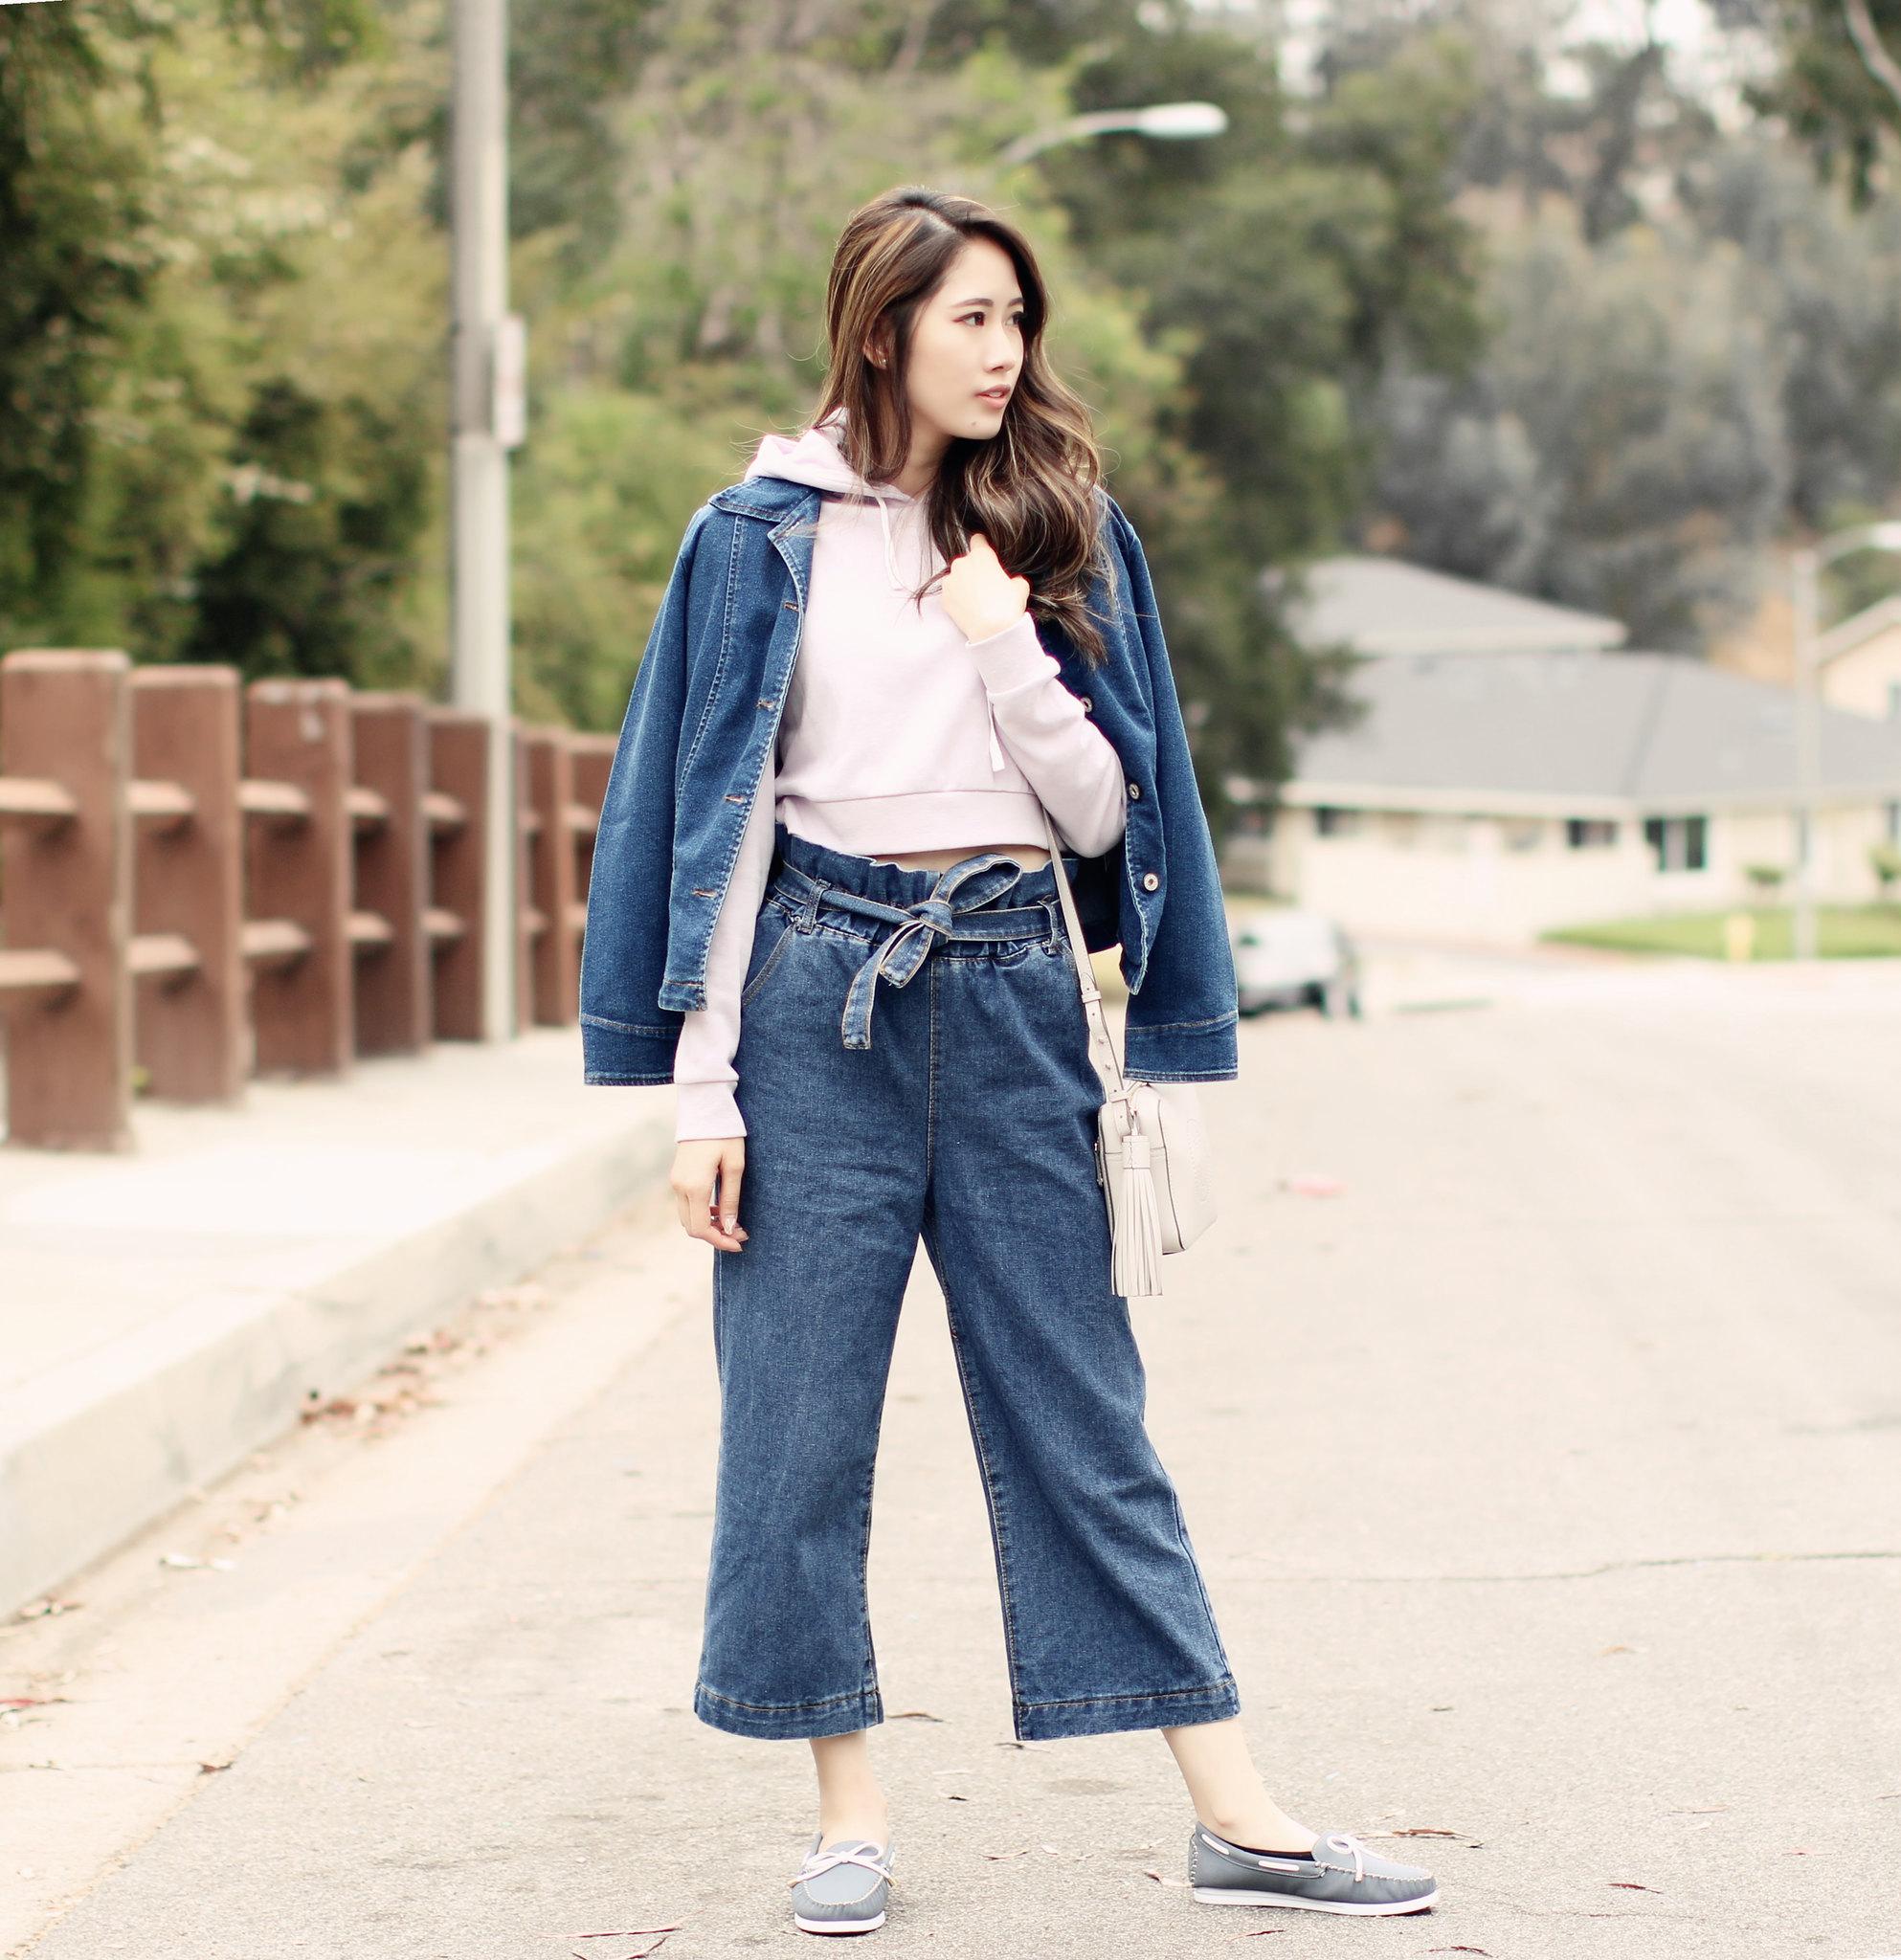 5083-ootd-fashion-style-outfitoftheday-wiwt-streetstyle-zara-f21xme-denim-thrifted-guess-koreanfashion-lookbook-elizabeeetht-clothestoyouuu